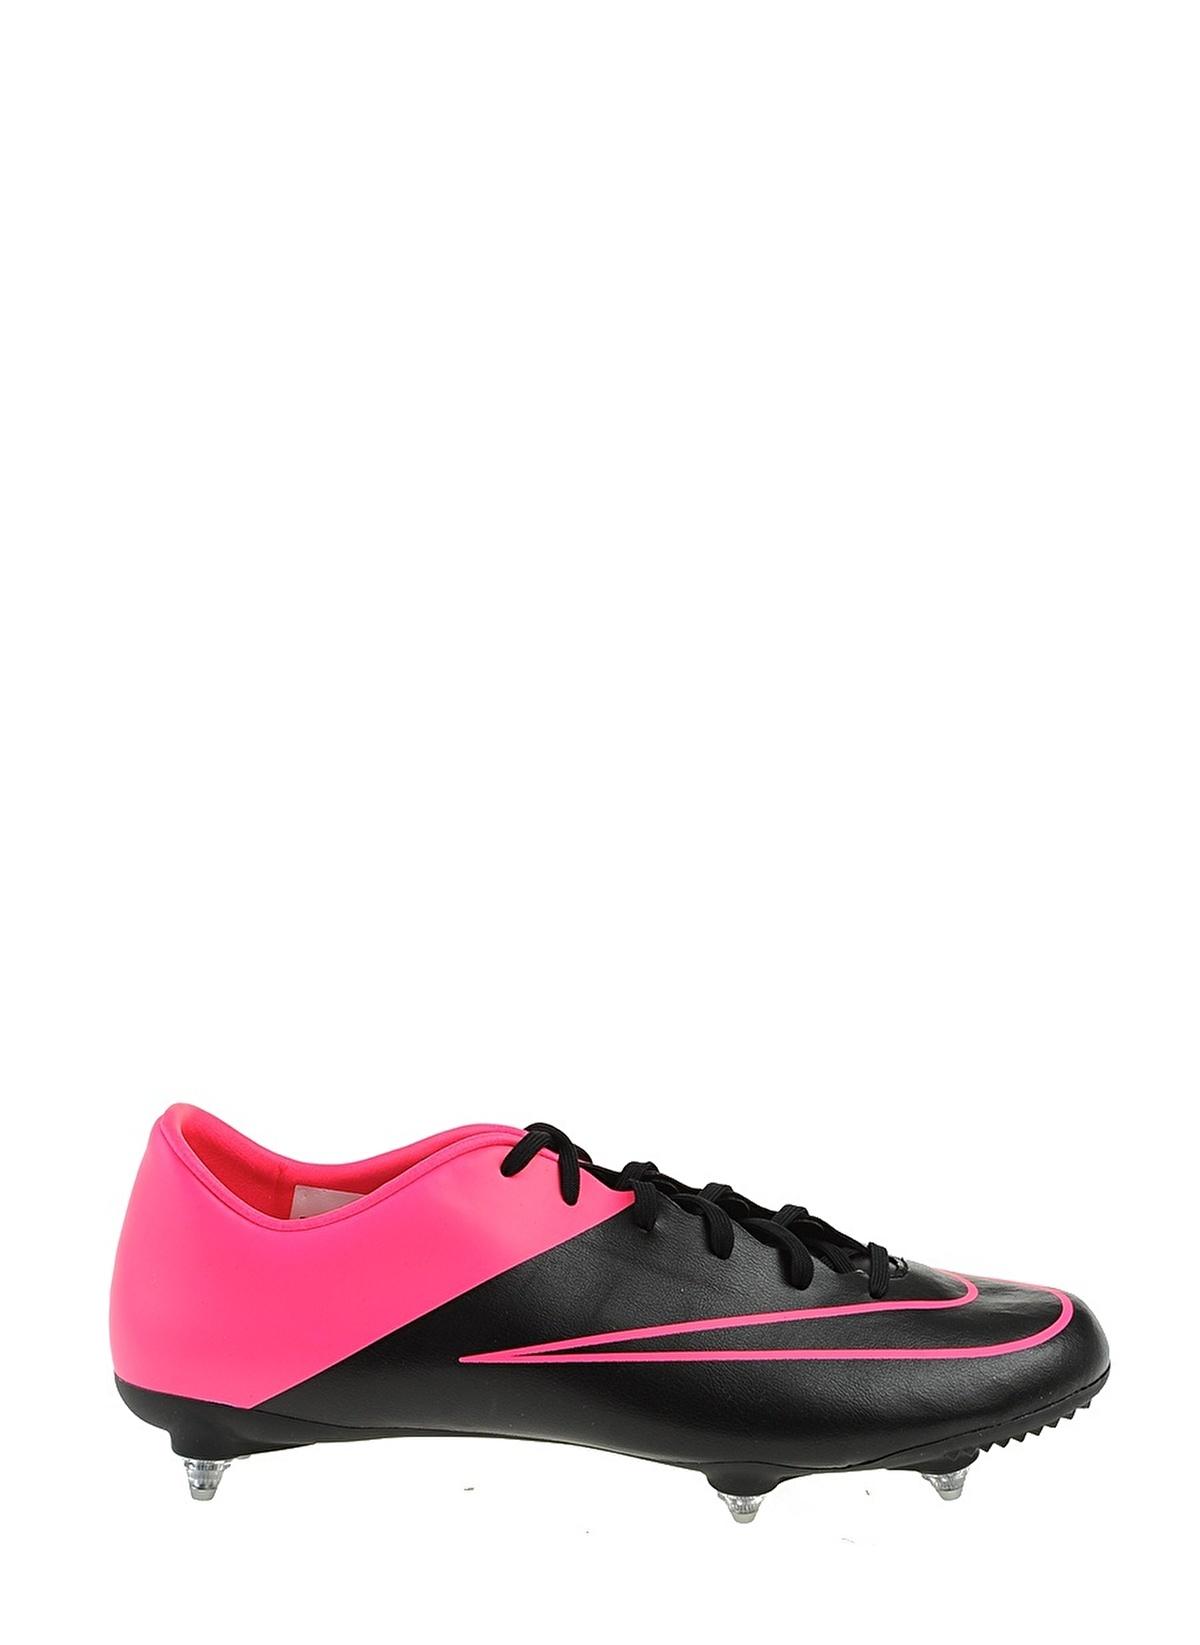 sneakers for cheap 45e28 e7727 651633-006-Mercurial-Victory-V-Sg